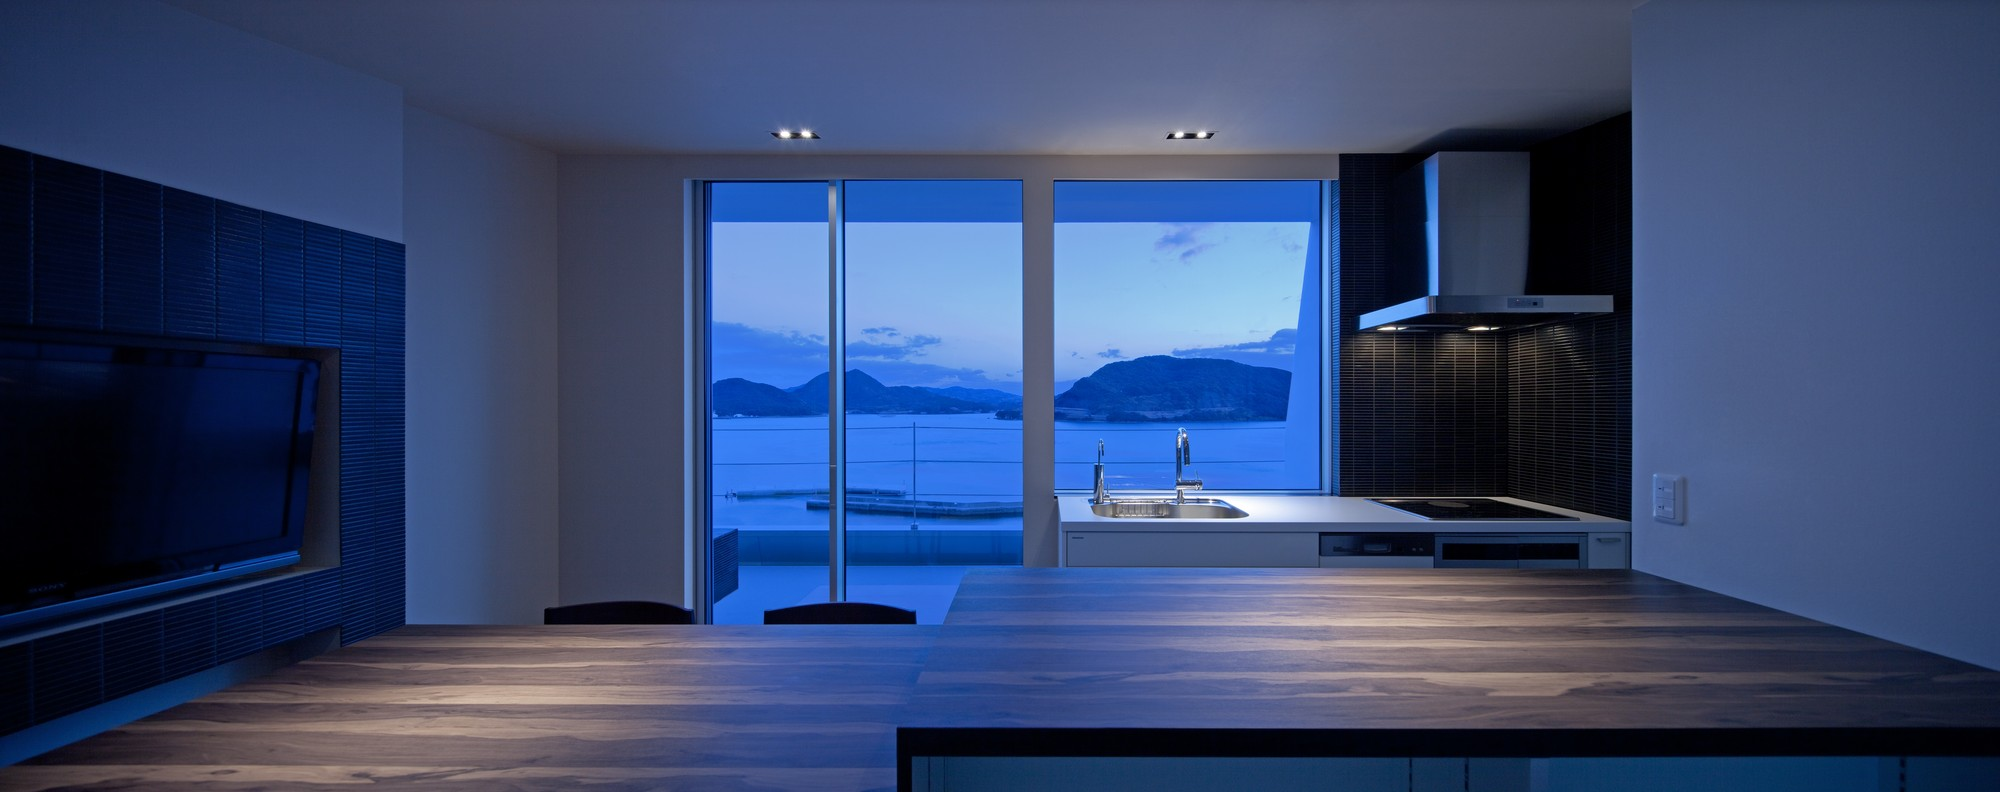 Galeria de i house architecture show 4 - Architecture shows ...